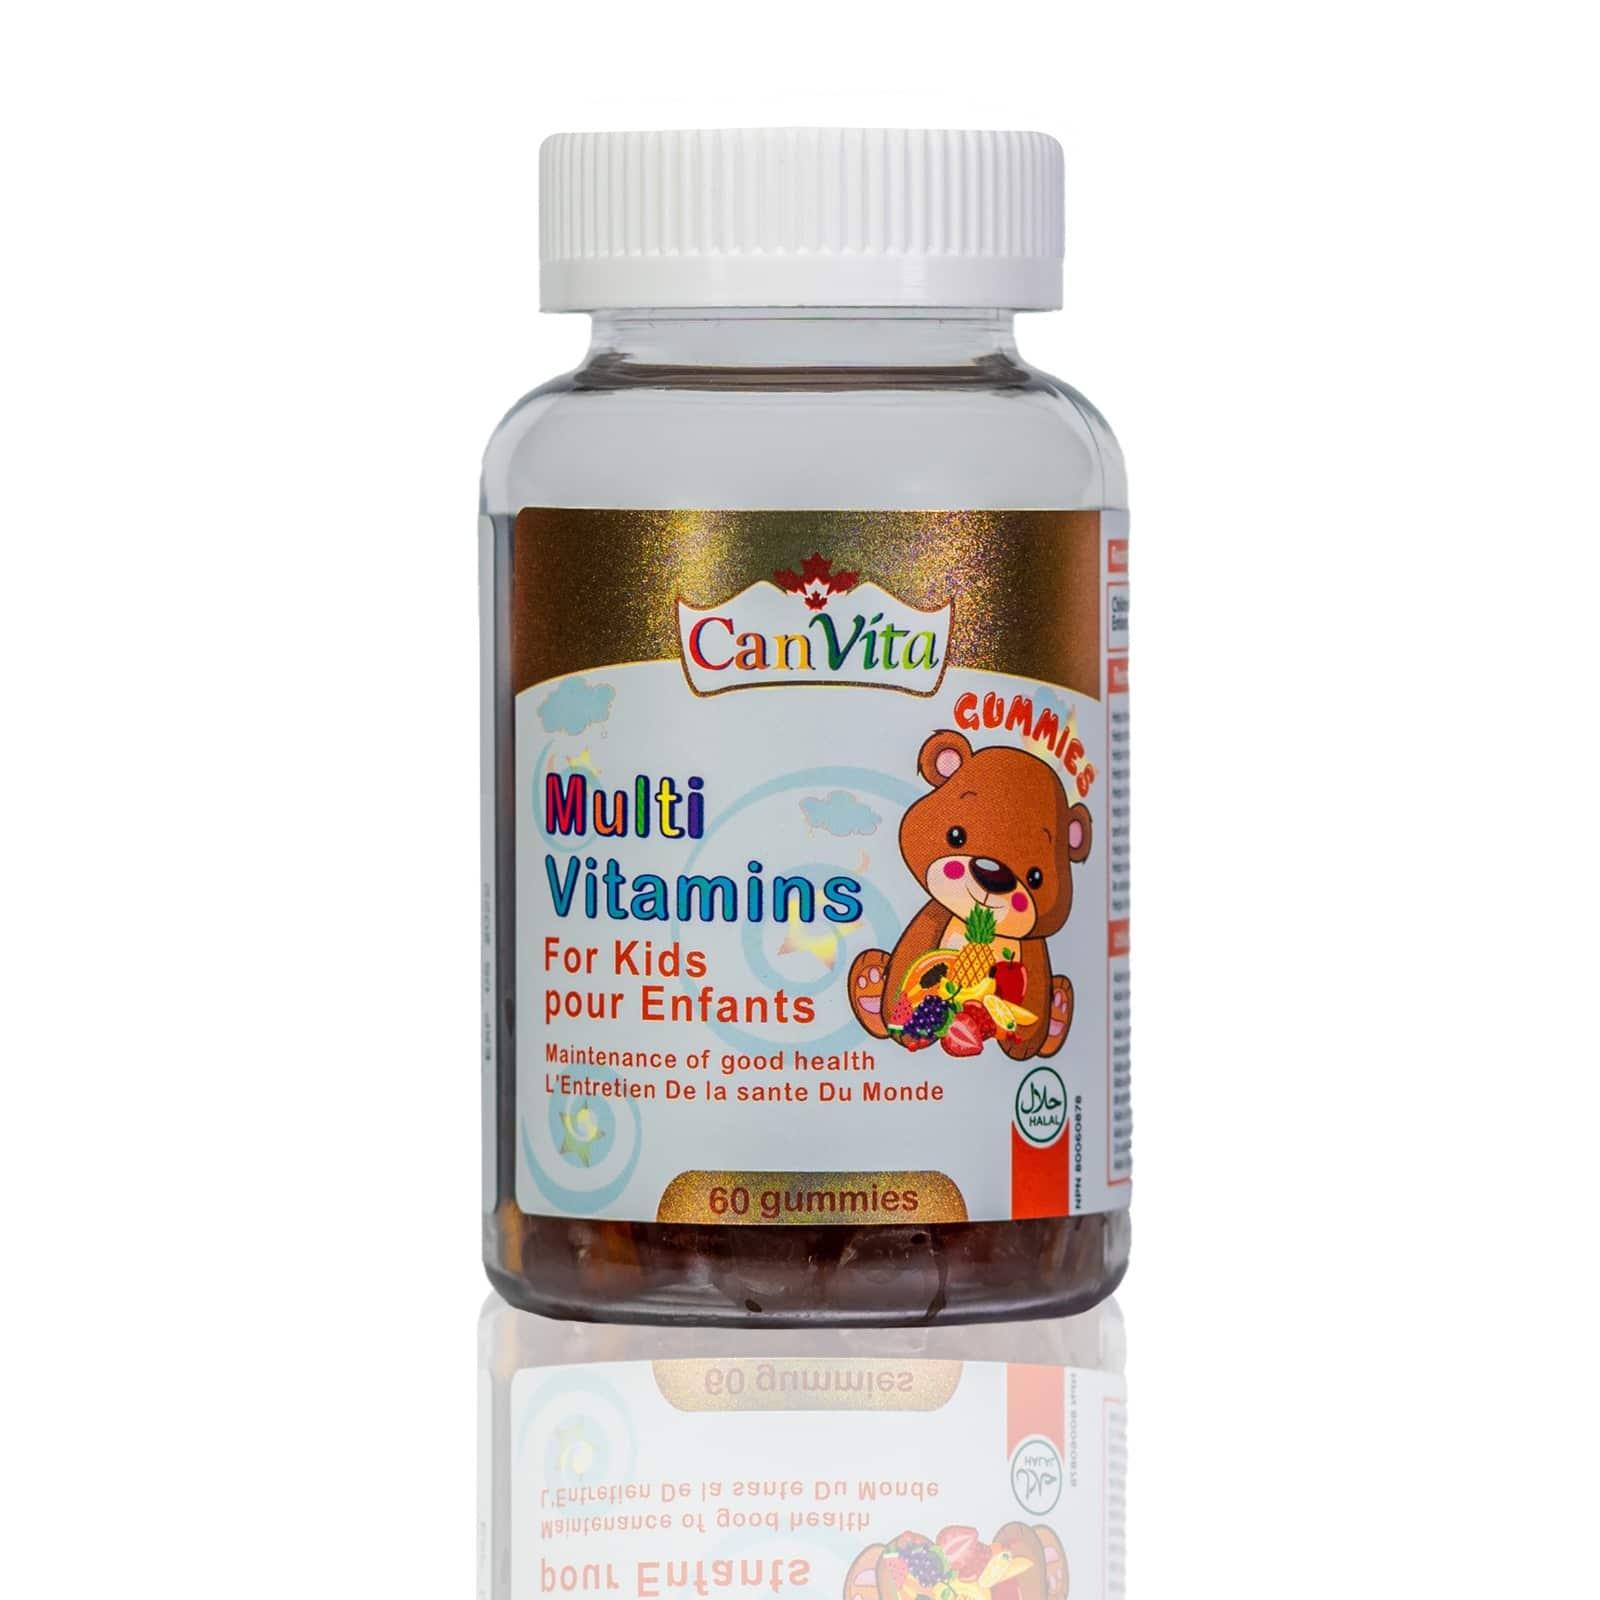 Canvita Kids multivitamin gummy